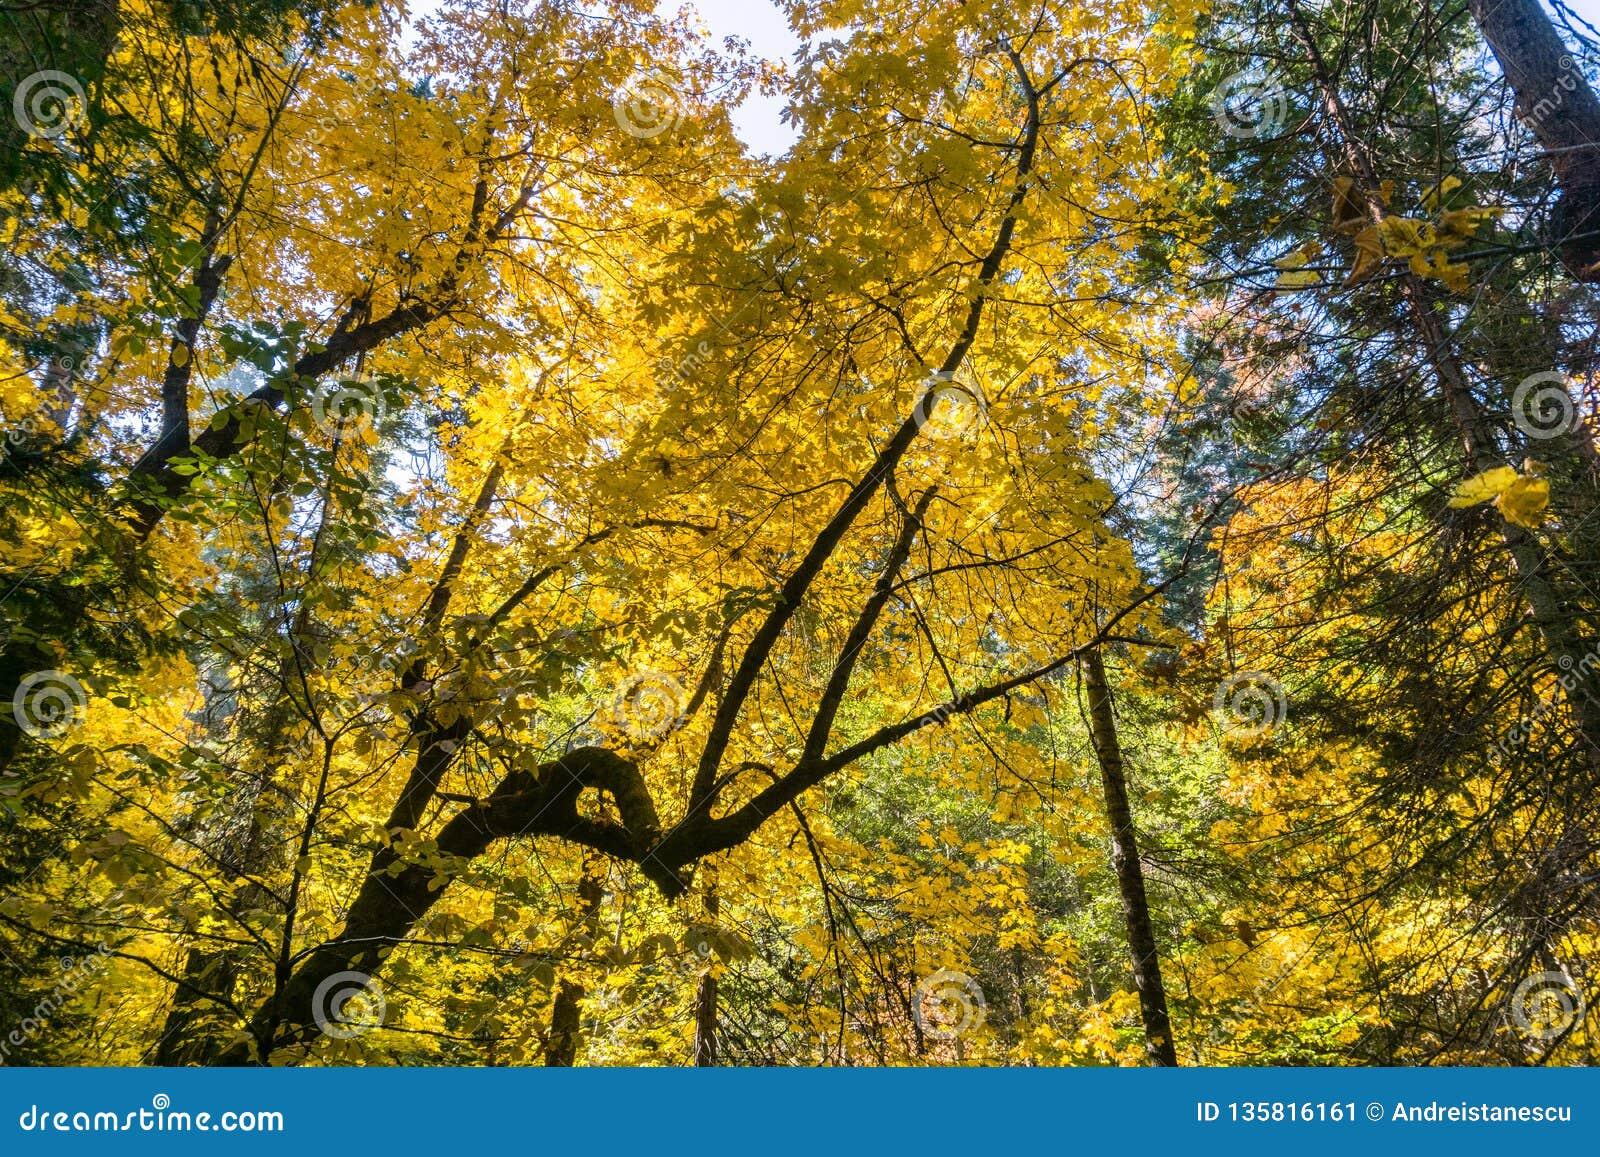 Golden Big Leaf Maple Tree Acer Macrophyllum Foliage Calaveras Big